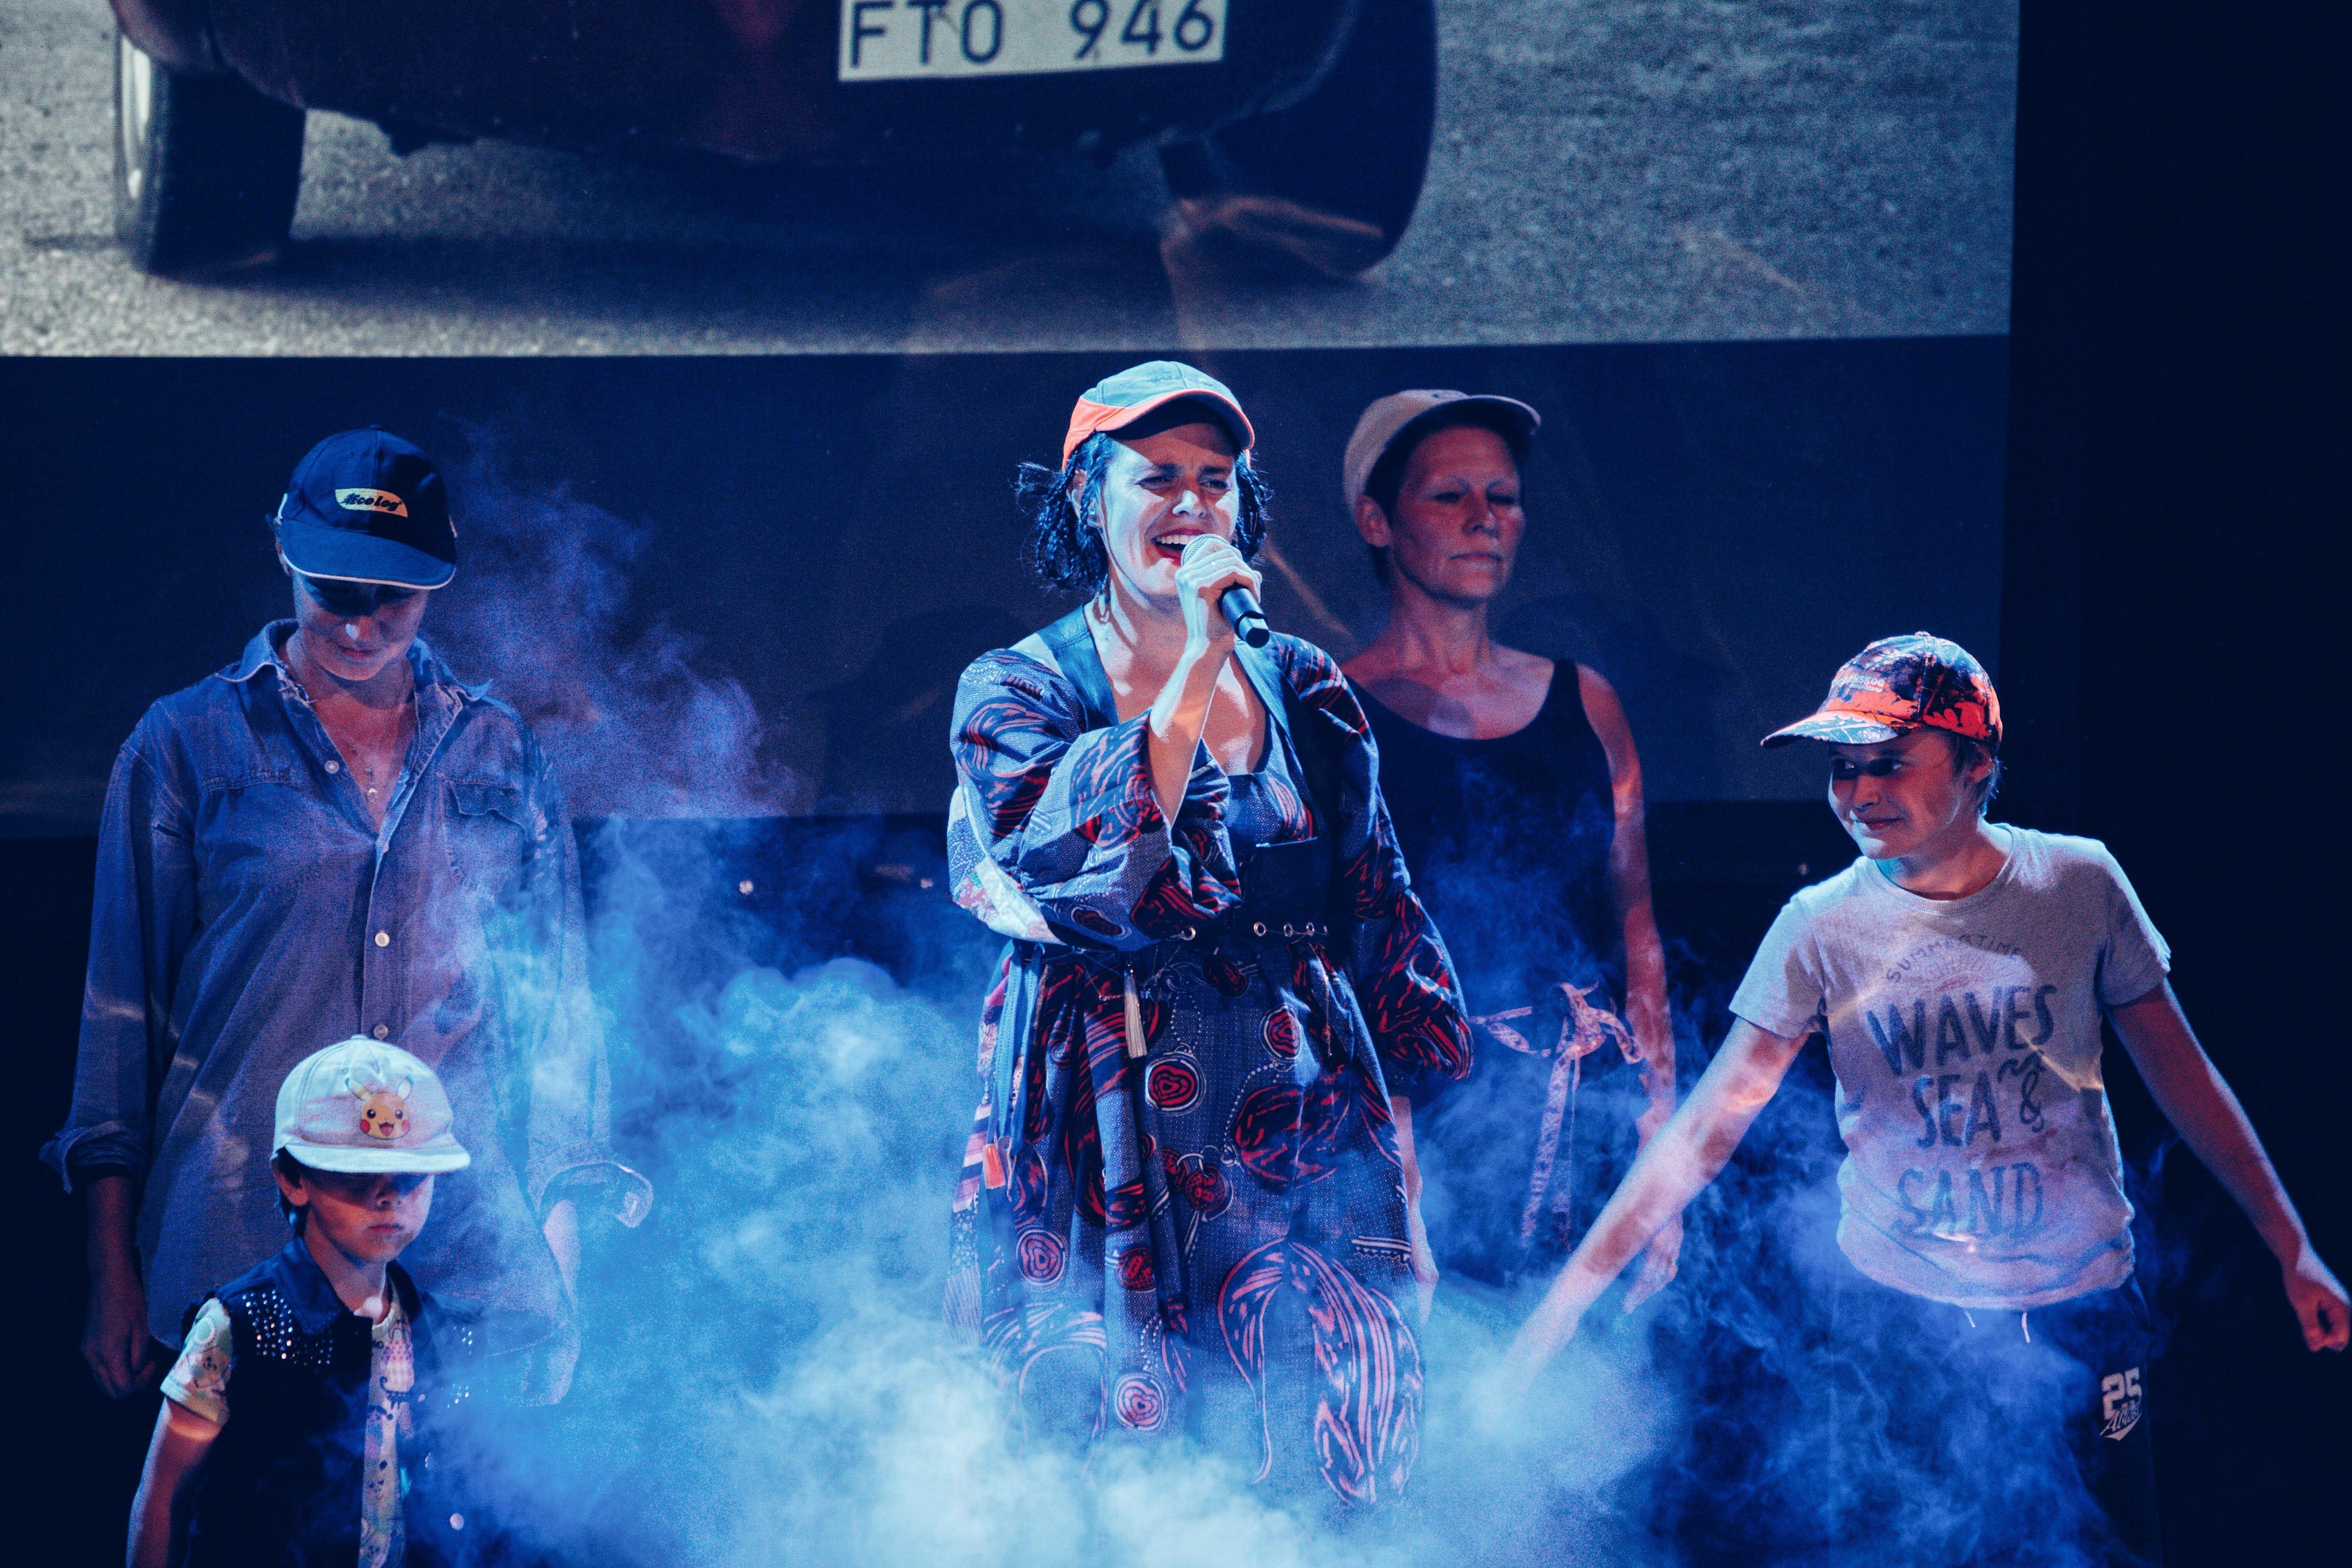 Max Tellving,  © teater, jättendal, Folkmusikens Queen B, teater, jättendal, Folkmusikens Queen B